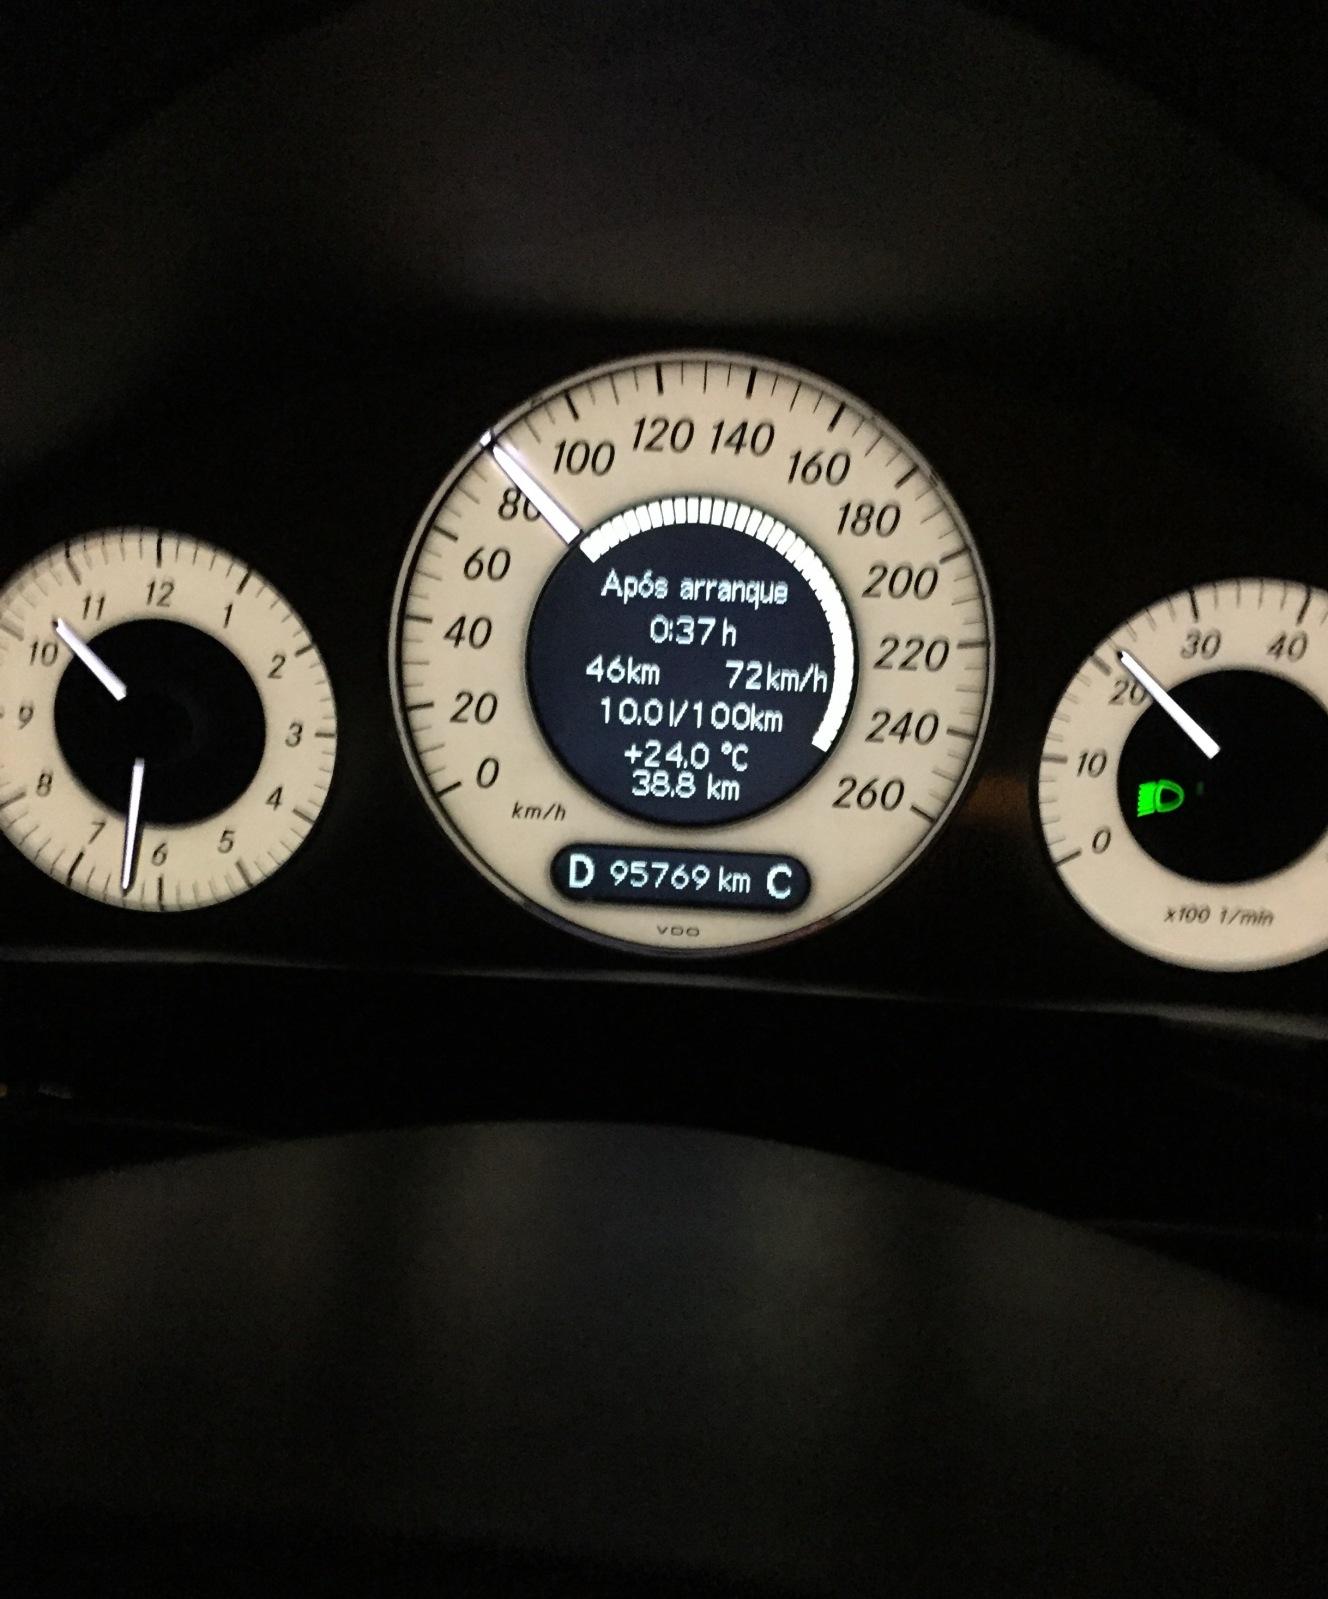 W211 EB4 E500 2009 - R$ 105.000,00 I3xymt